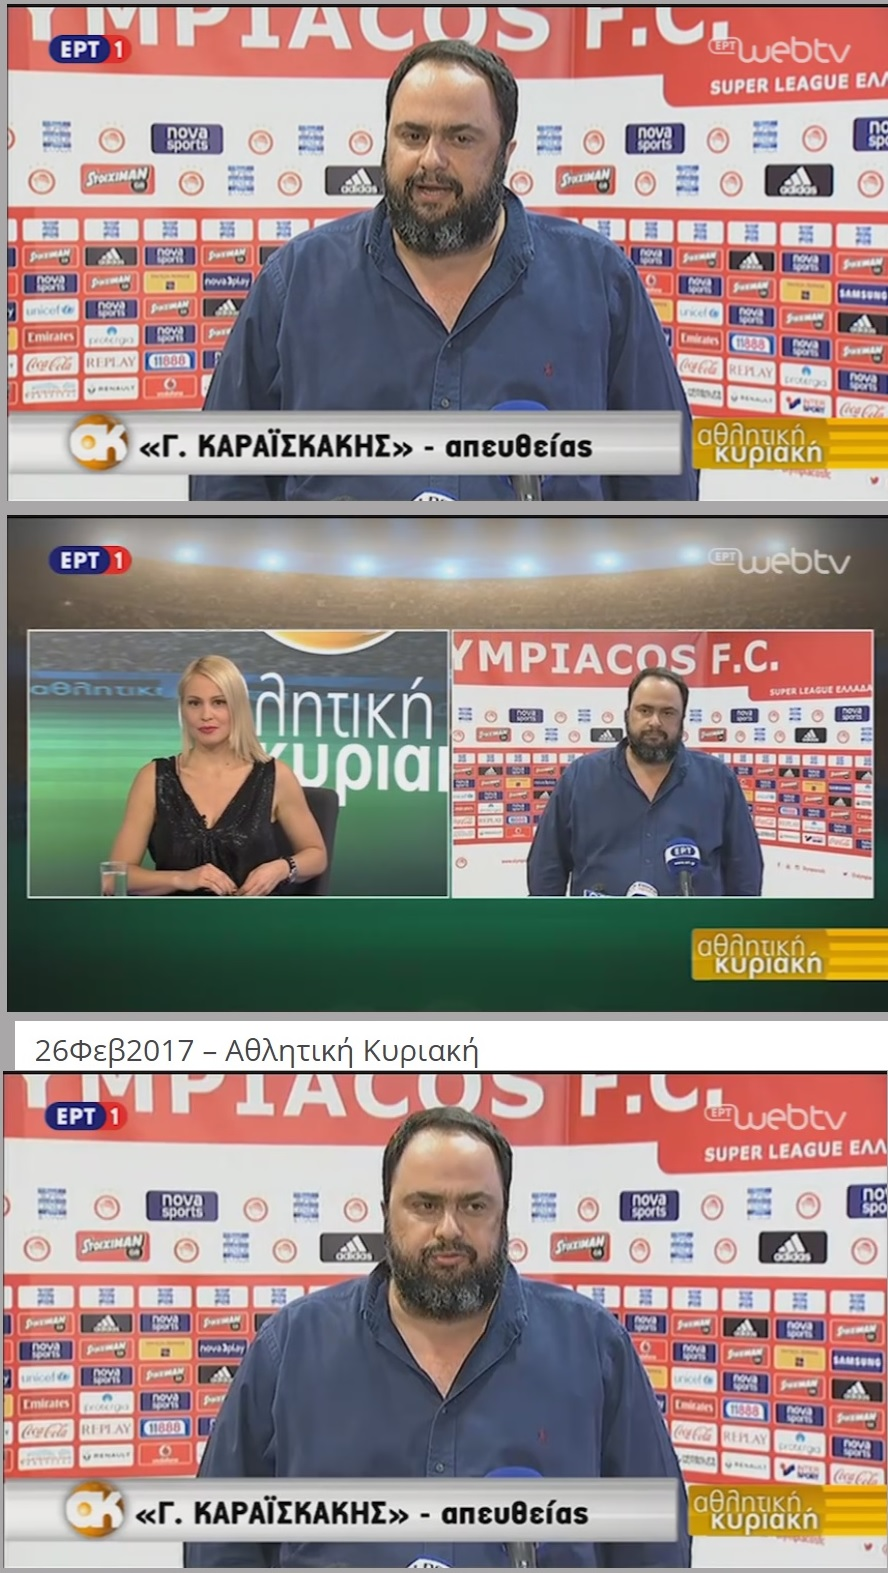 football-osfp-vs-panionios-win-anastasopoulou-marinakhs-08-270217